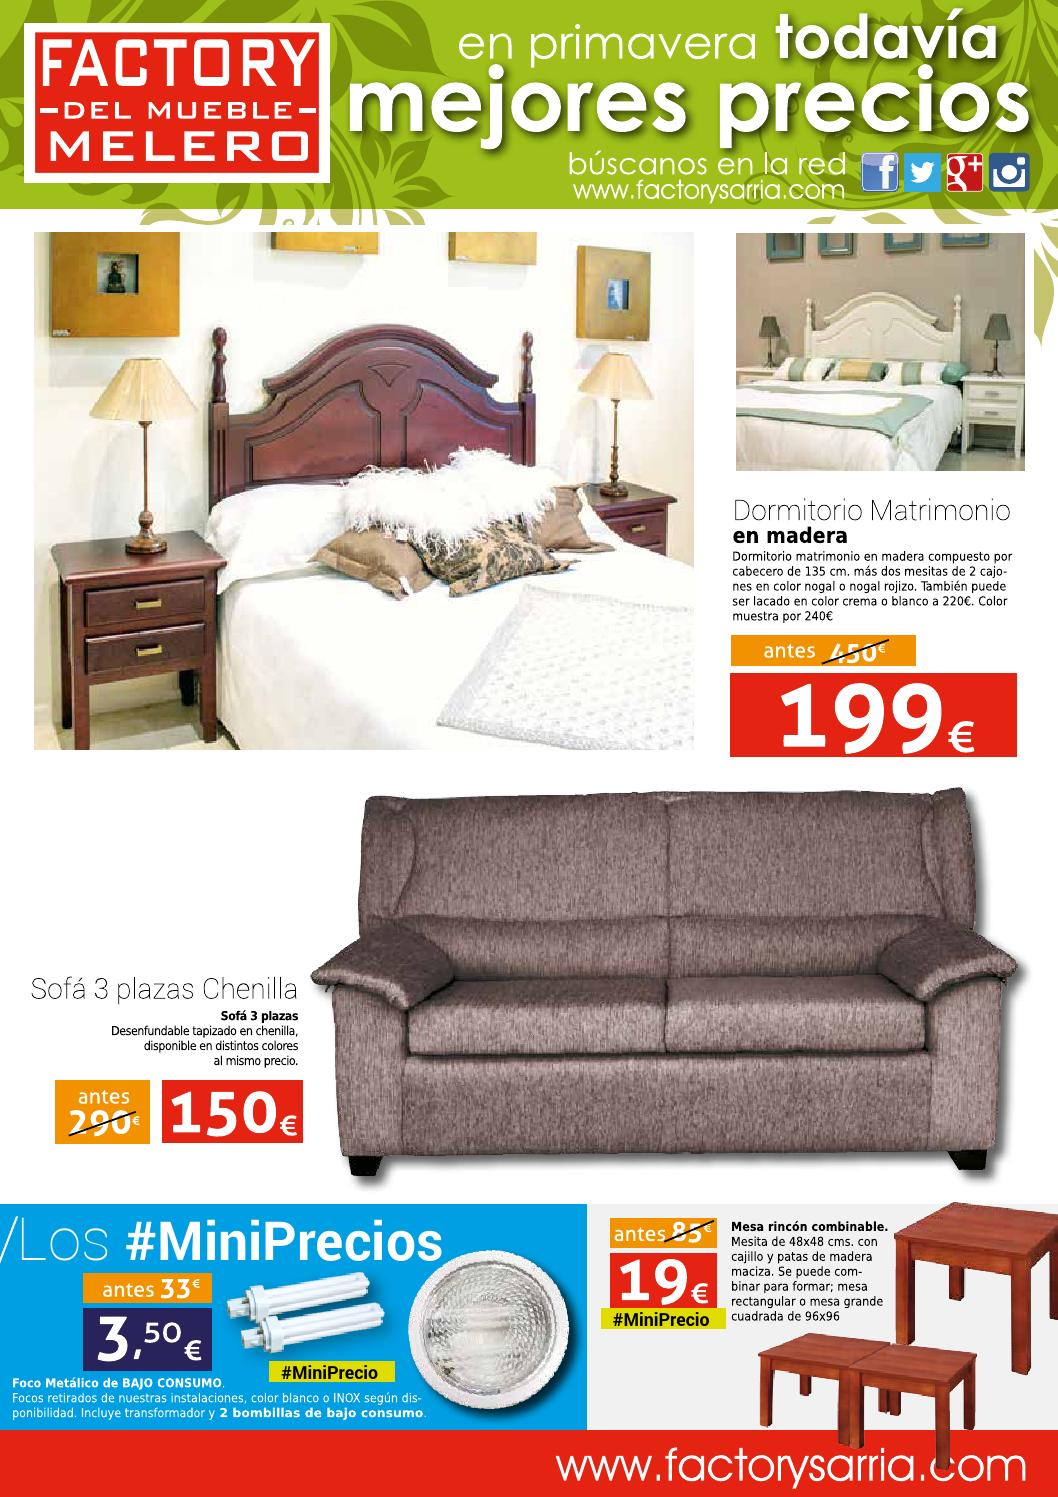 Factory febrero 2015 issuu by muebles sarria issuu - Muebles sarria dos hermanas ...